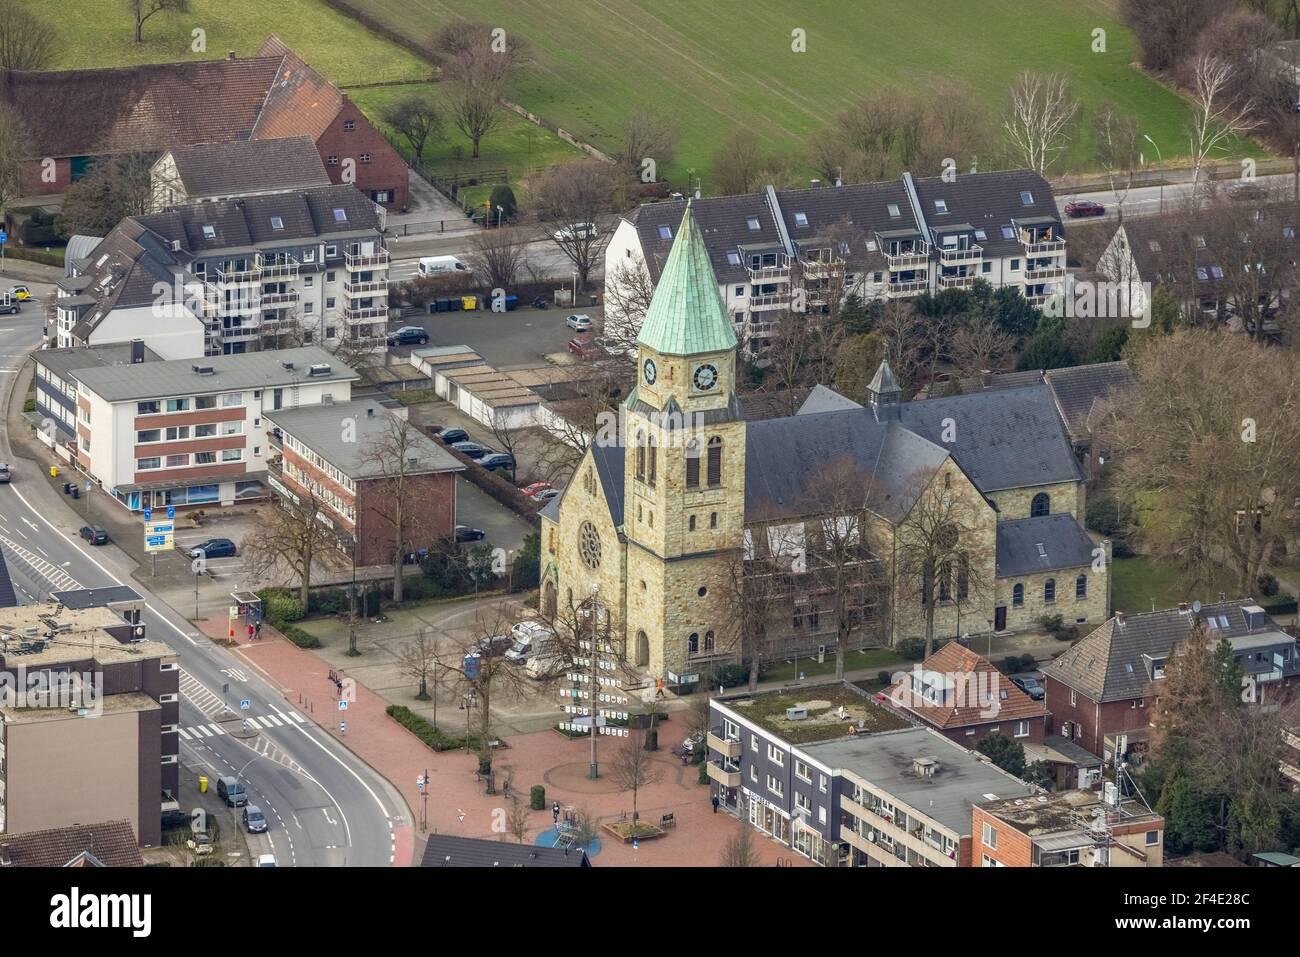 Luftaufnahme, St. Johannes Kirche Kirchhellen, Hans-Büning-Platz, Bottrop-Kirchhellen, Ruhrgebiet, Nordrhein-Westfalen, Deutschland, Bottrop, DE, Europa, Stockfoto